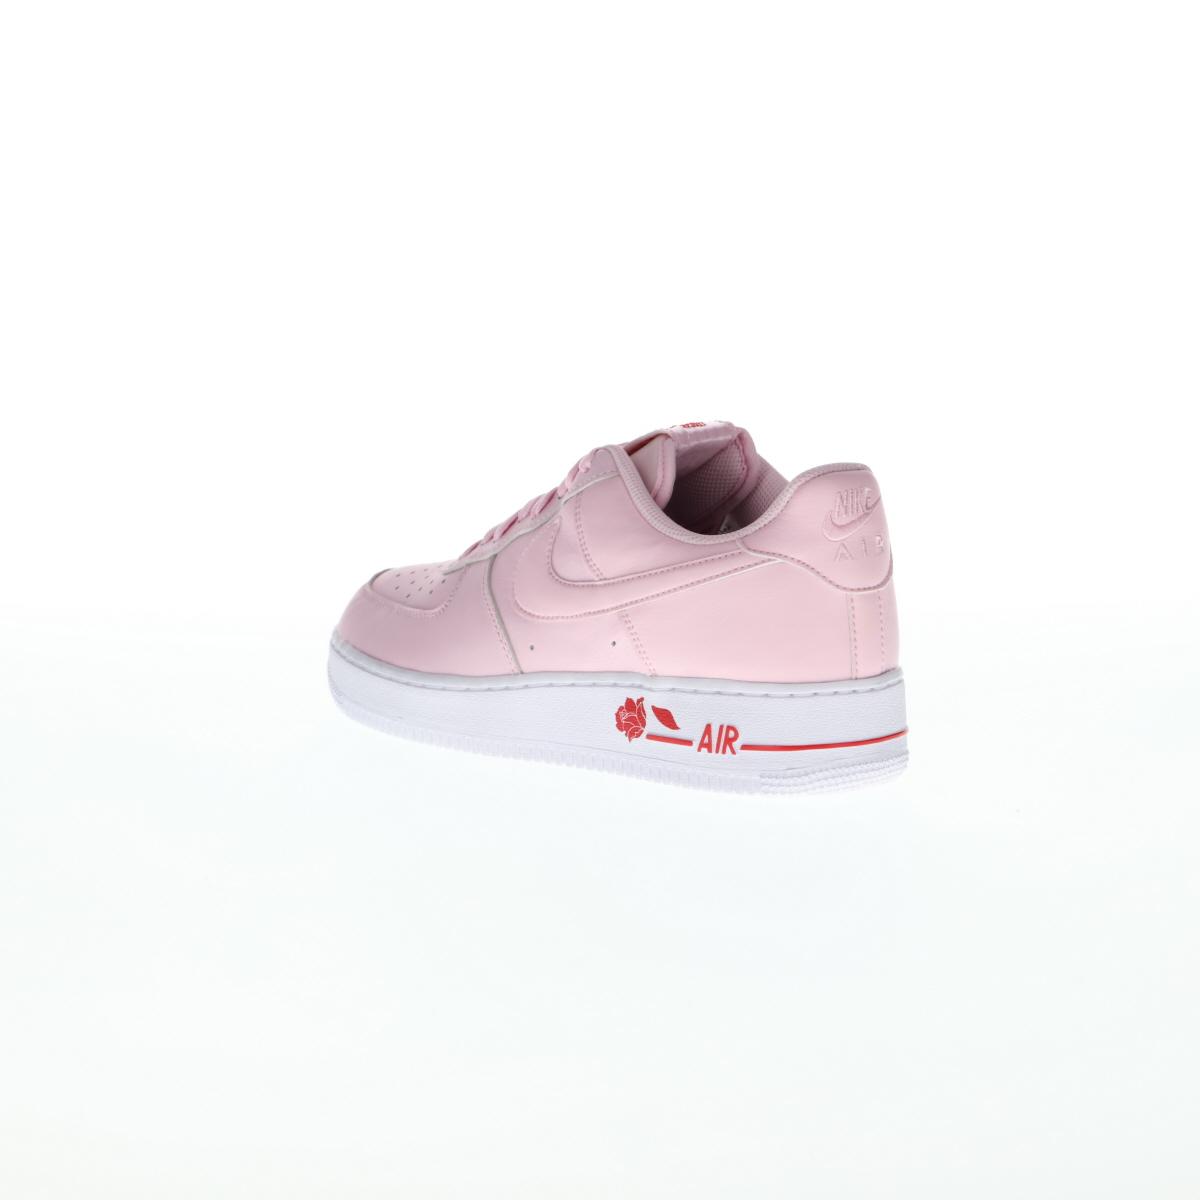 nike sandals benassi kids sale philippines free